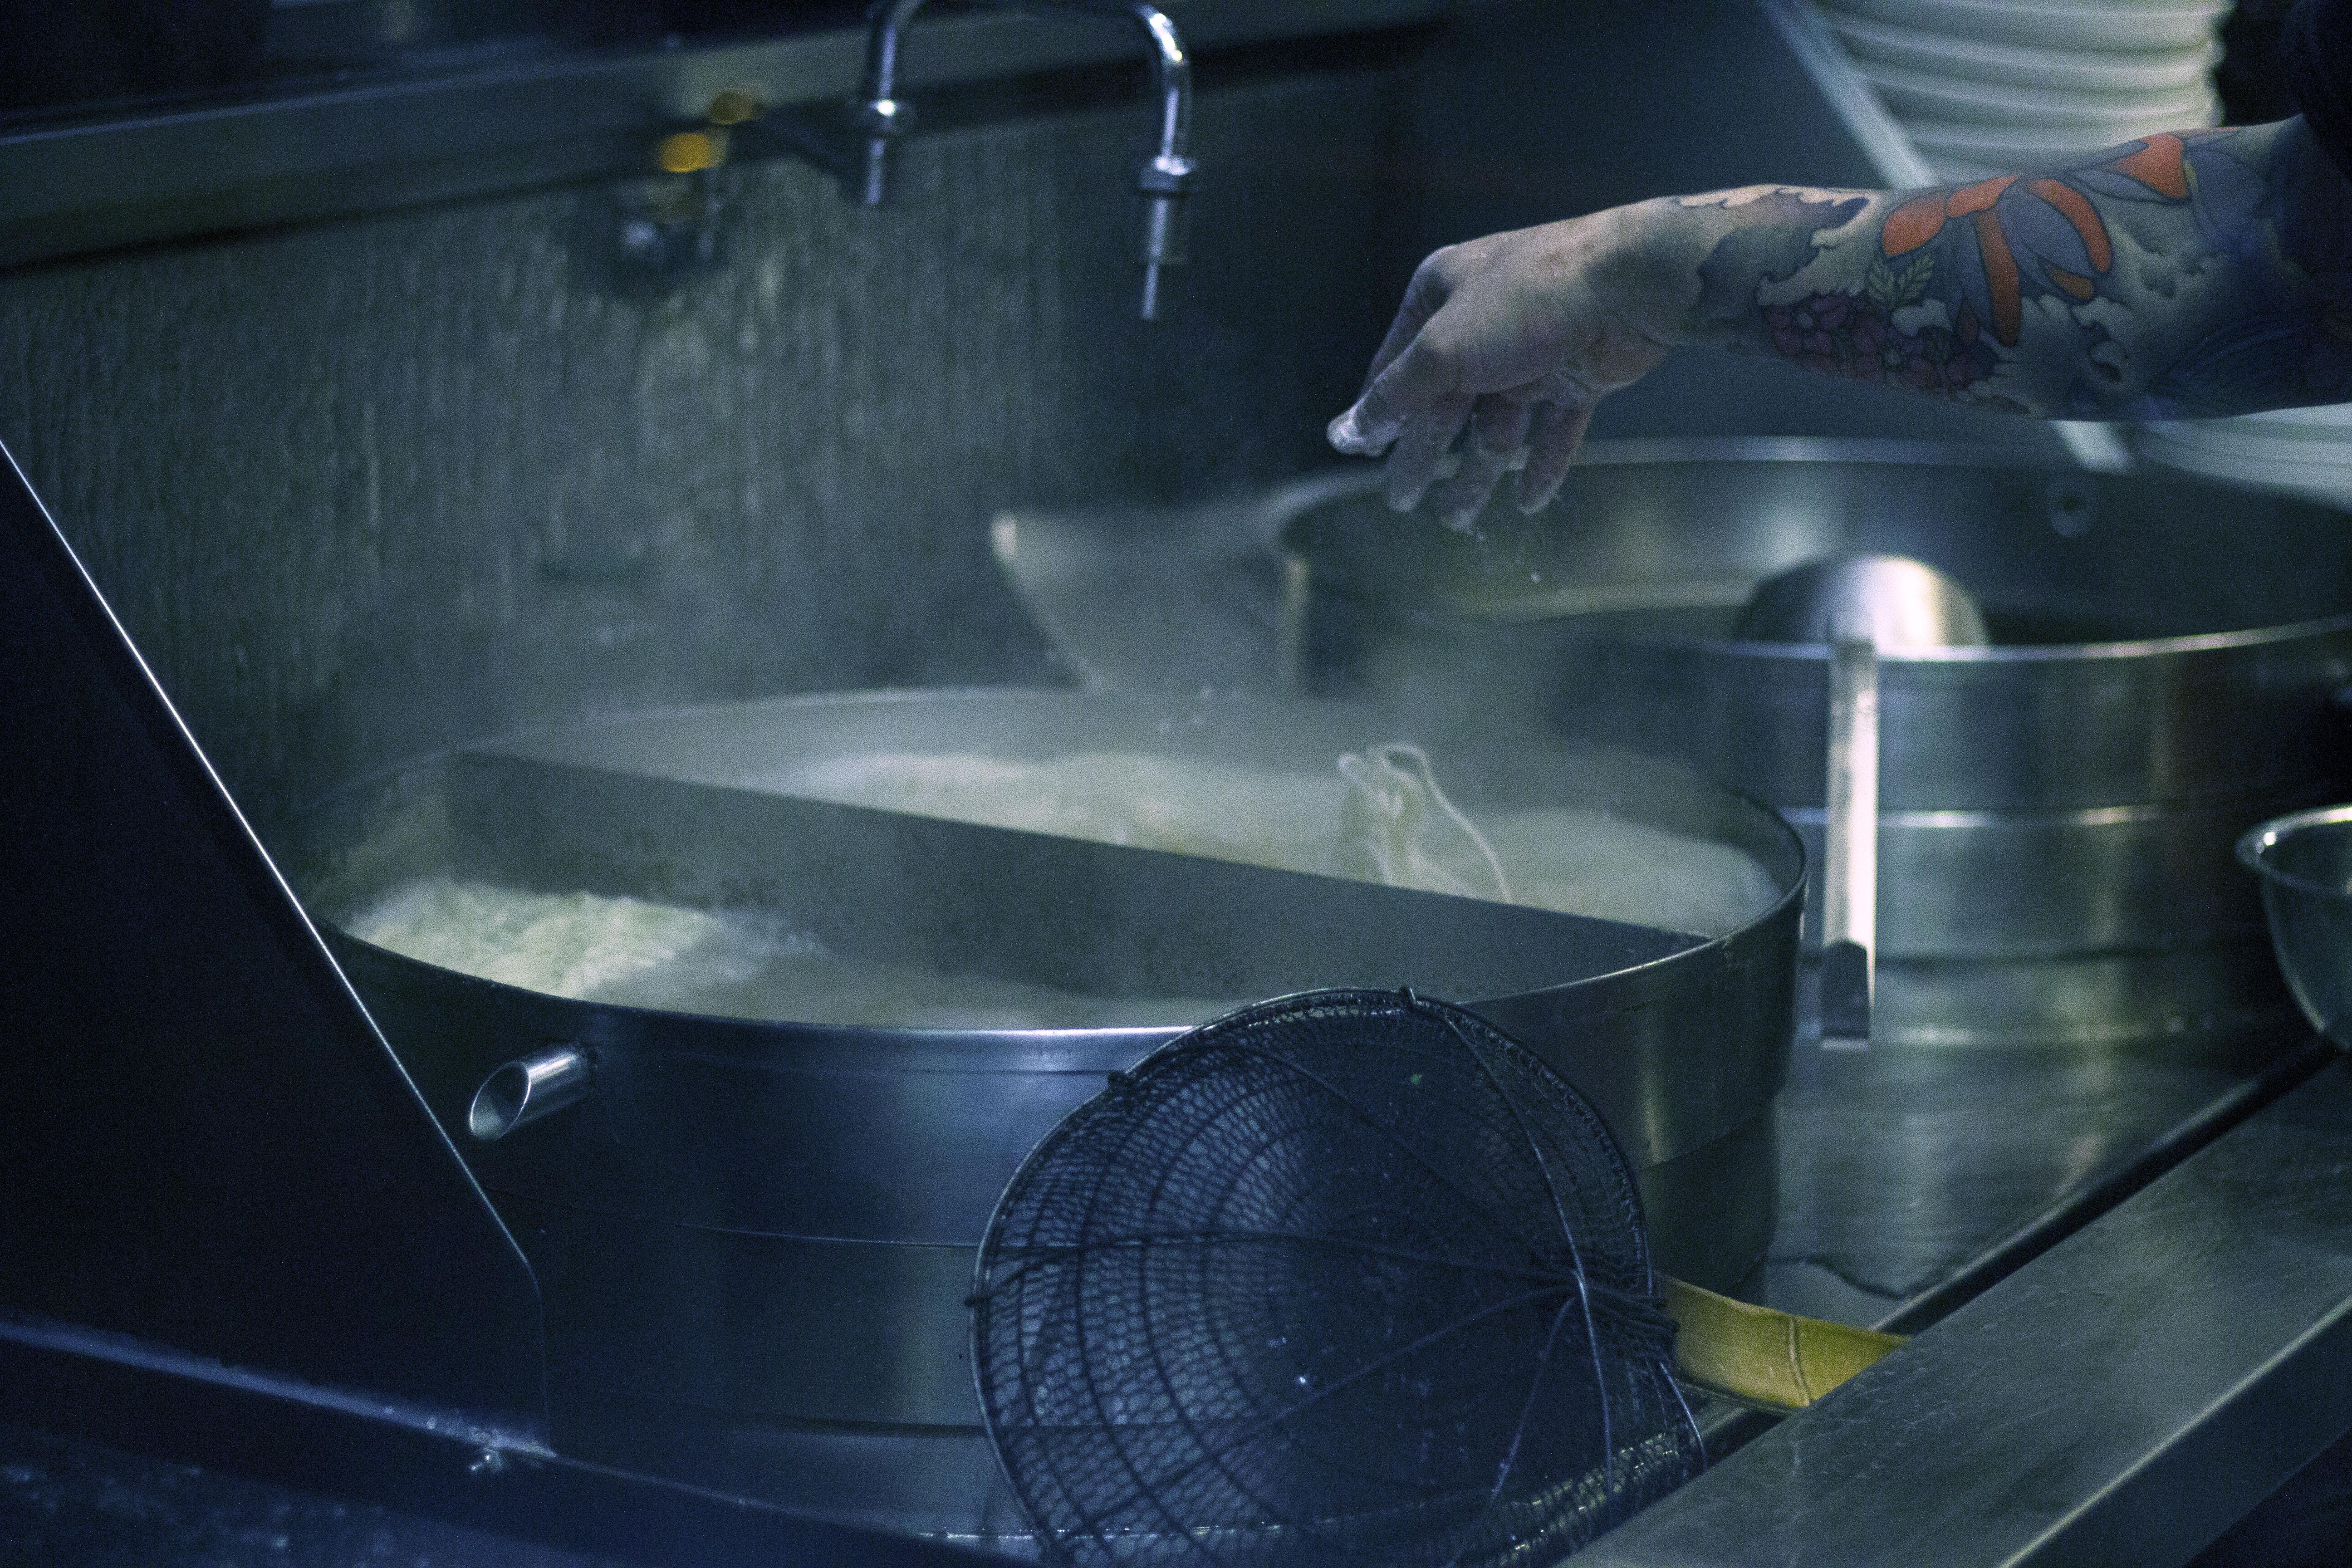 Cooking Noodles